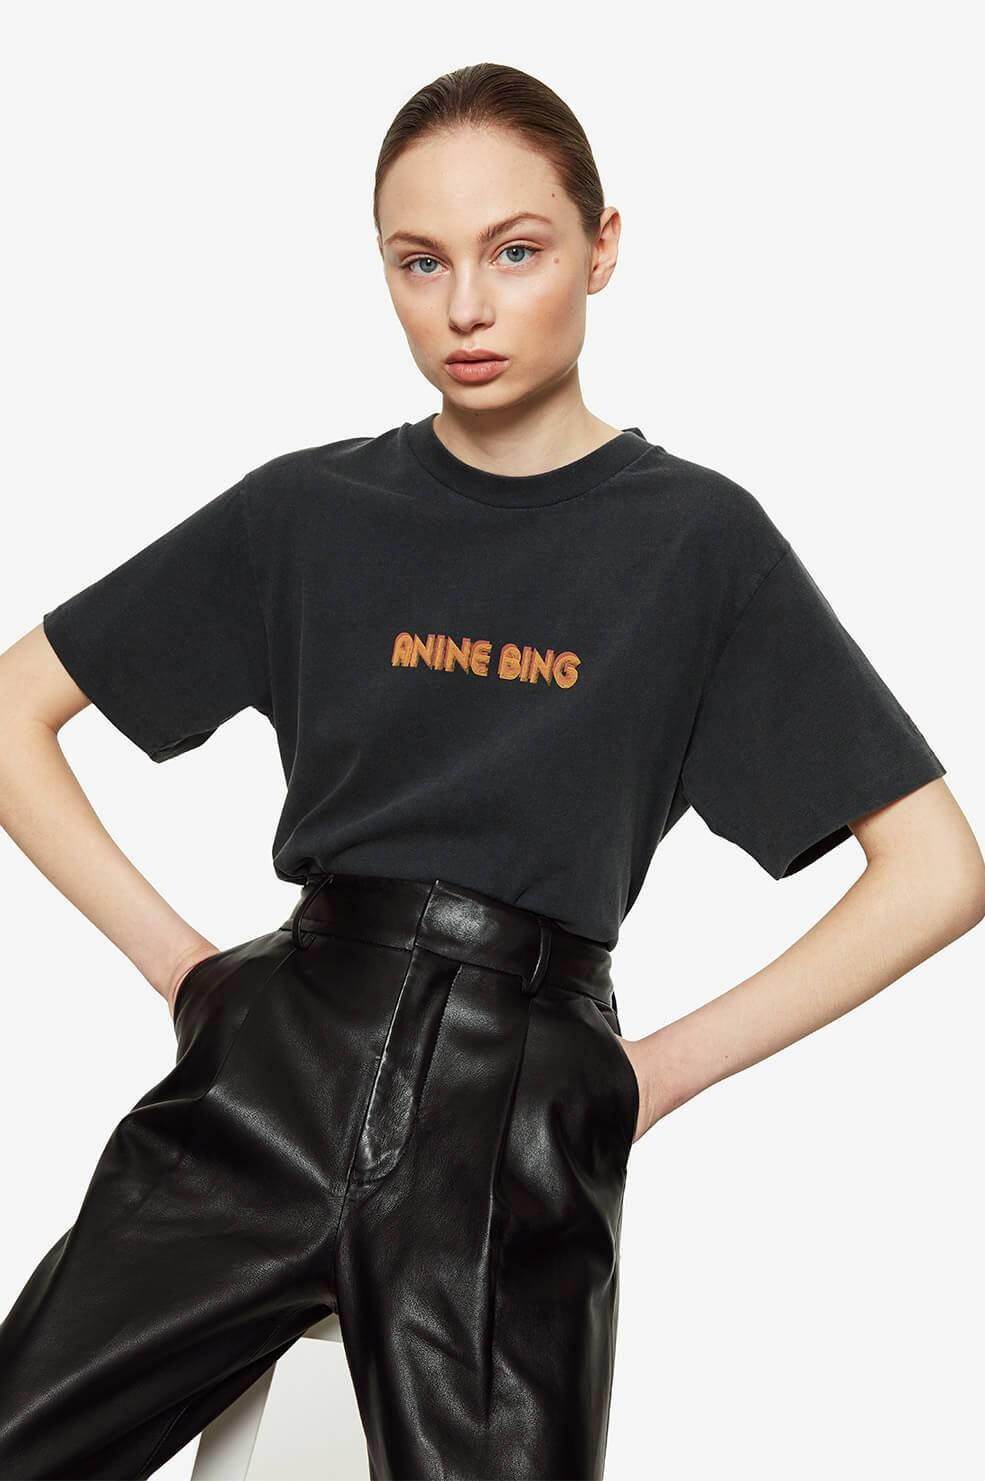 ANINE BING t shirt lili retro-4